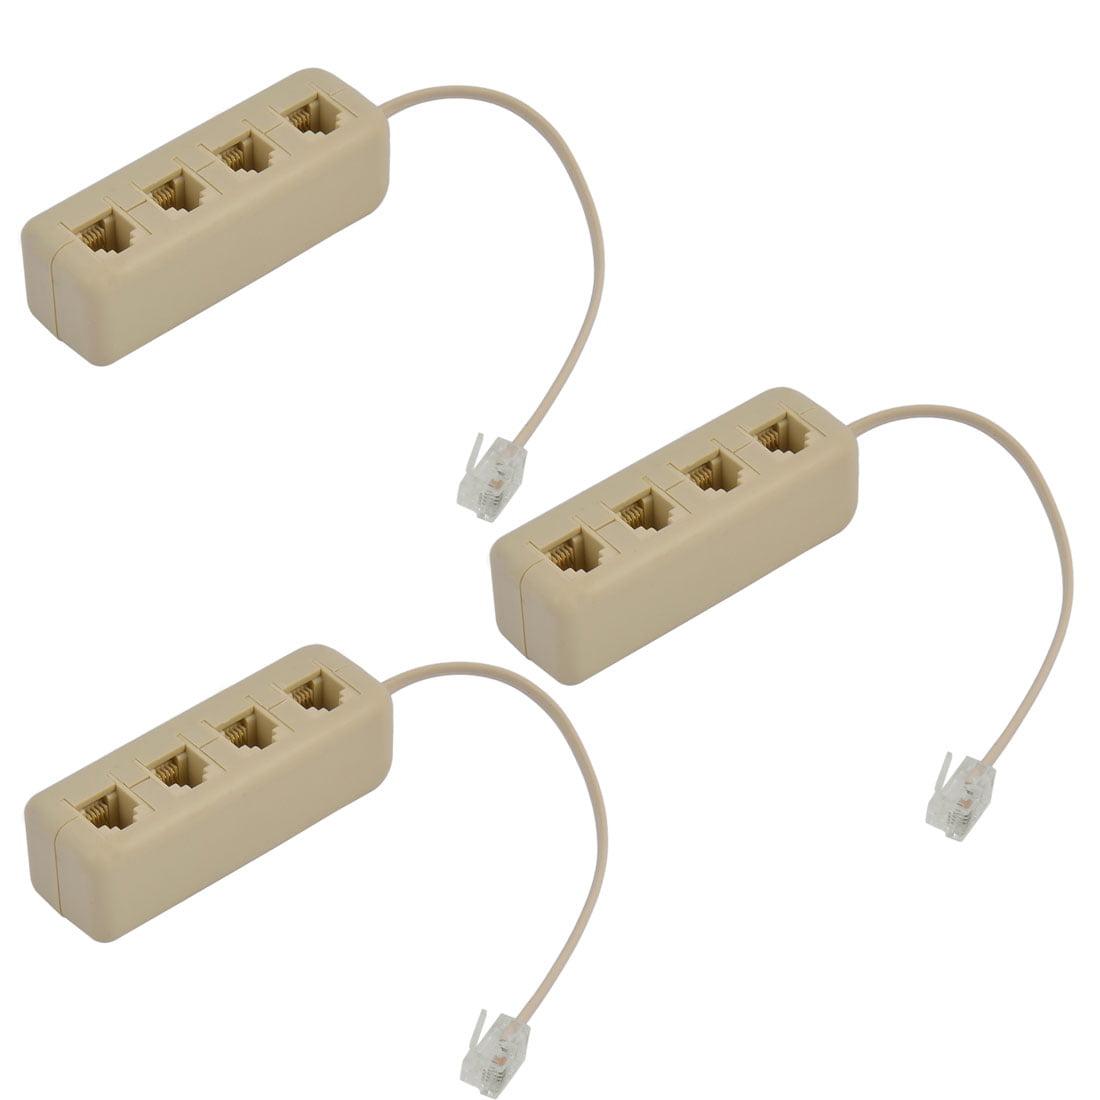 3pcs Telephone 6P4C RJ11 Keystone 1 Male to 4 Female Plug Cord Adapter Beige